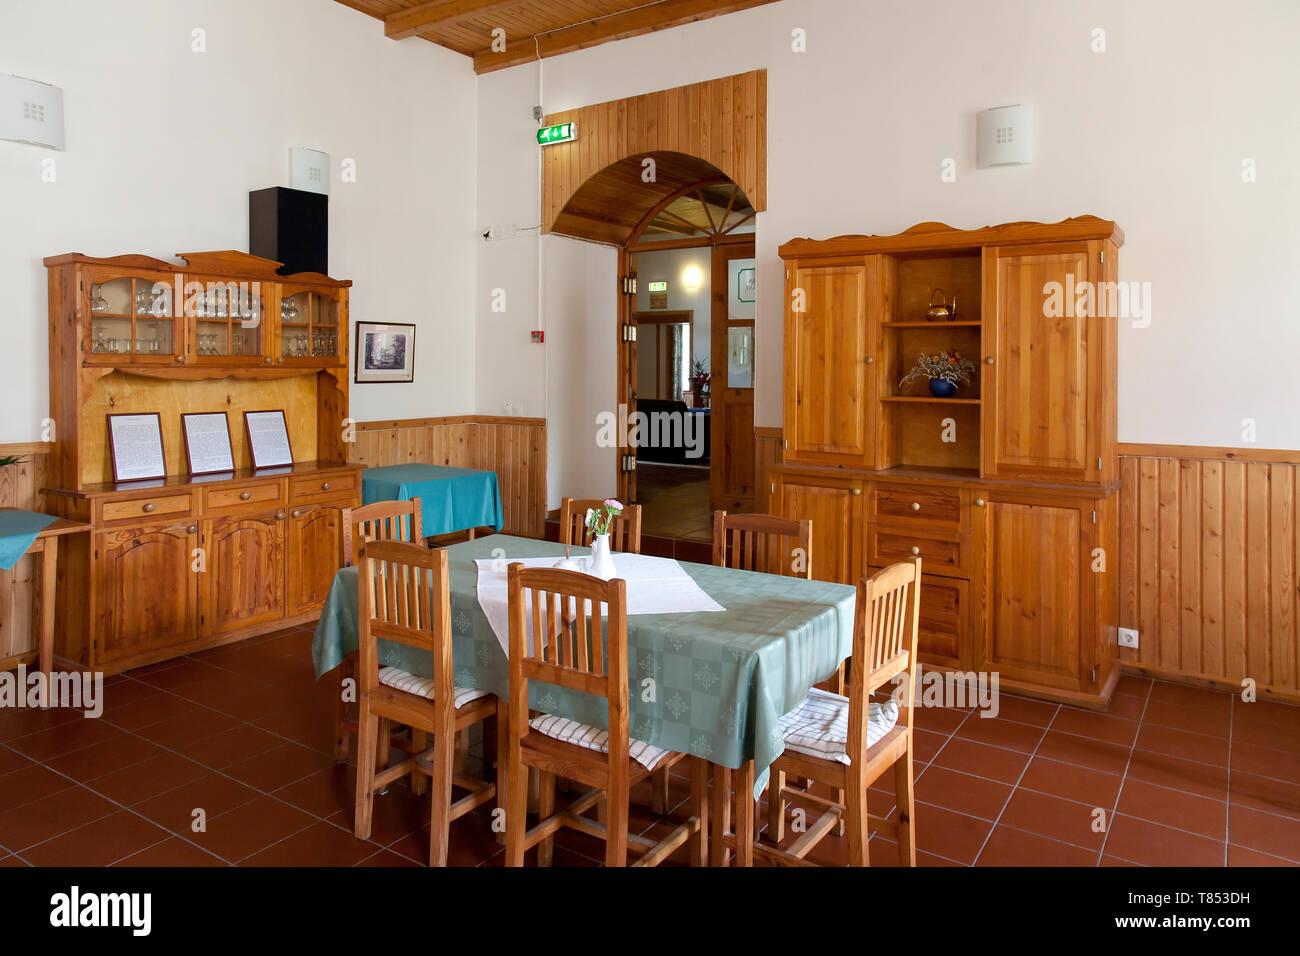 Palmse Manor Restaurant Dining Room - Stock Image